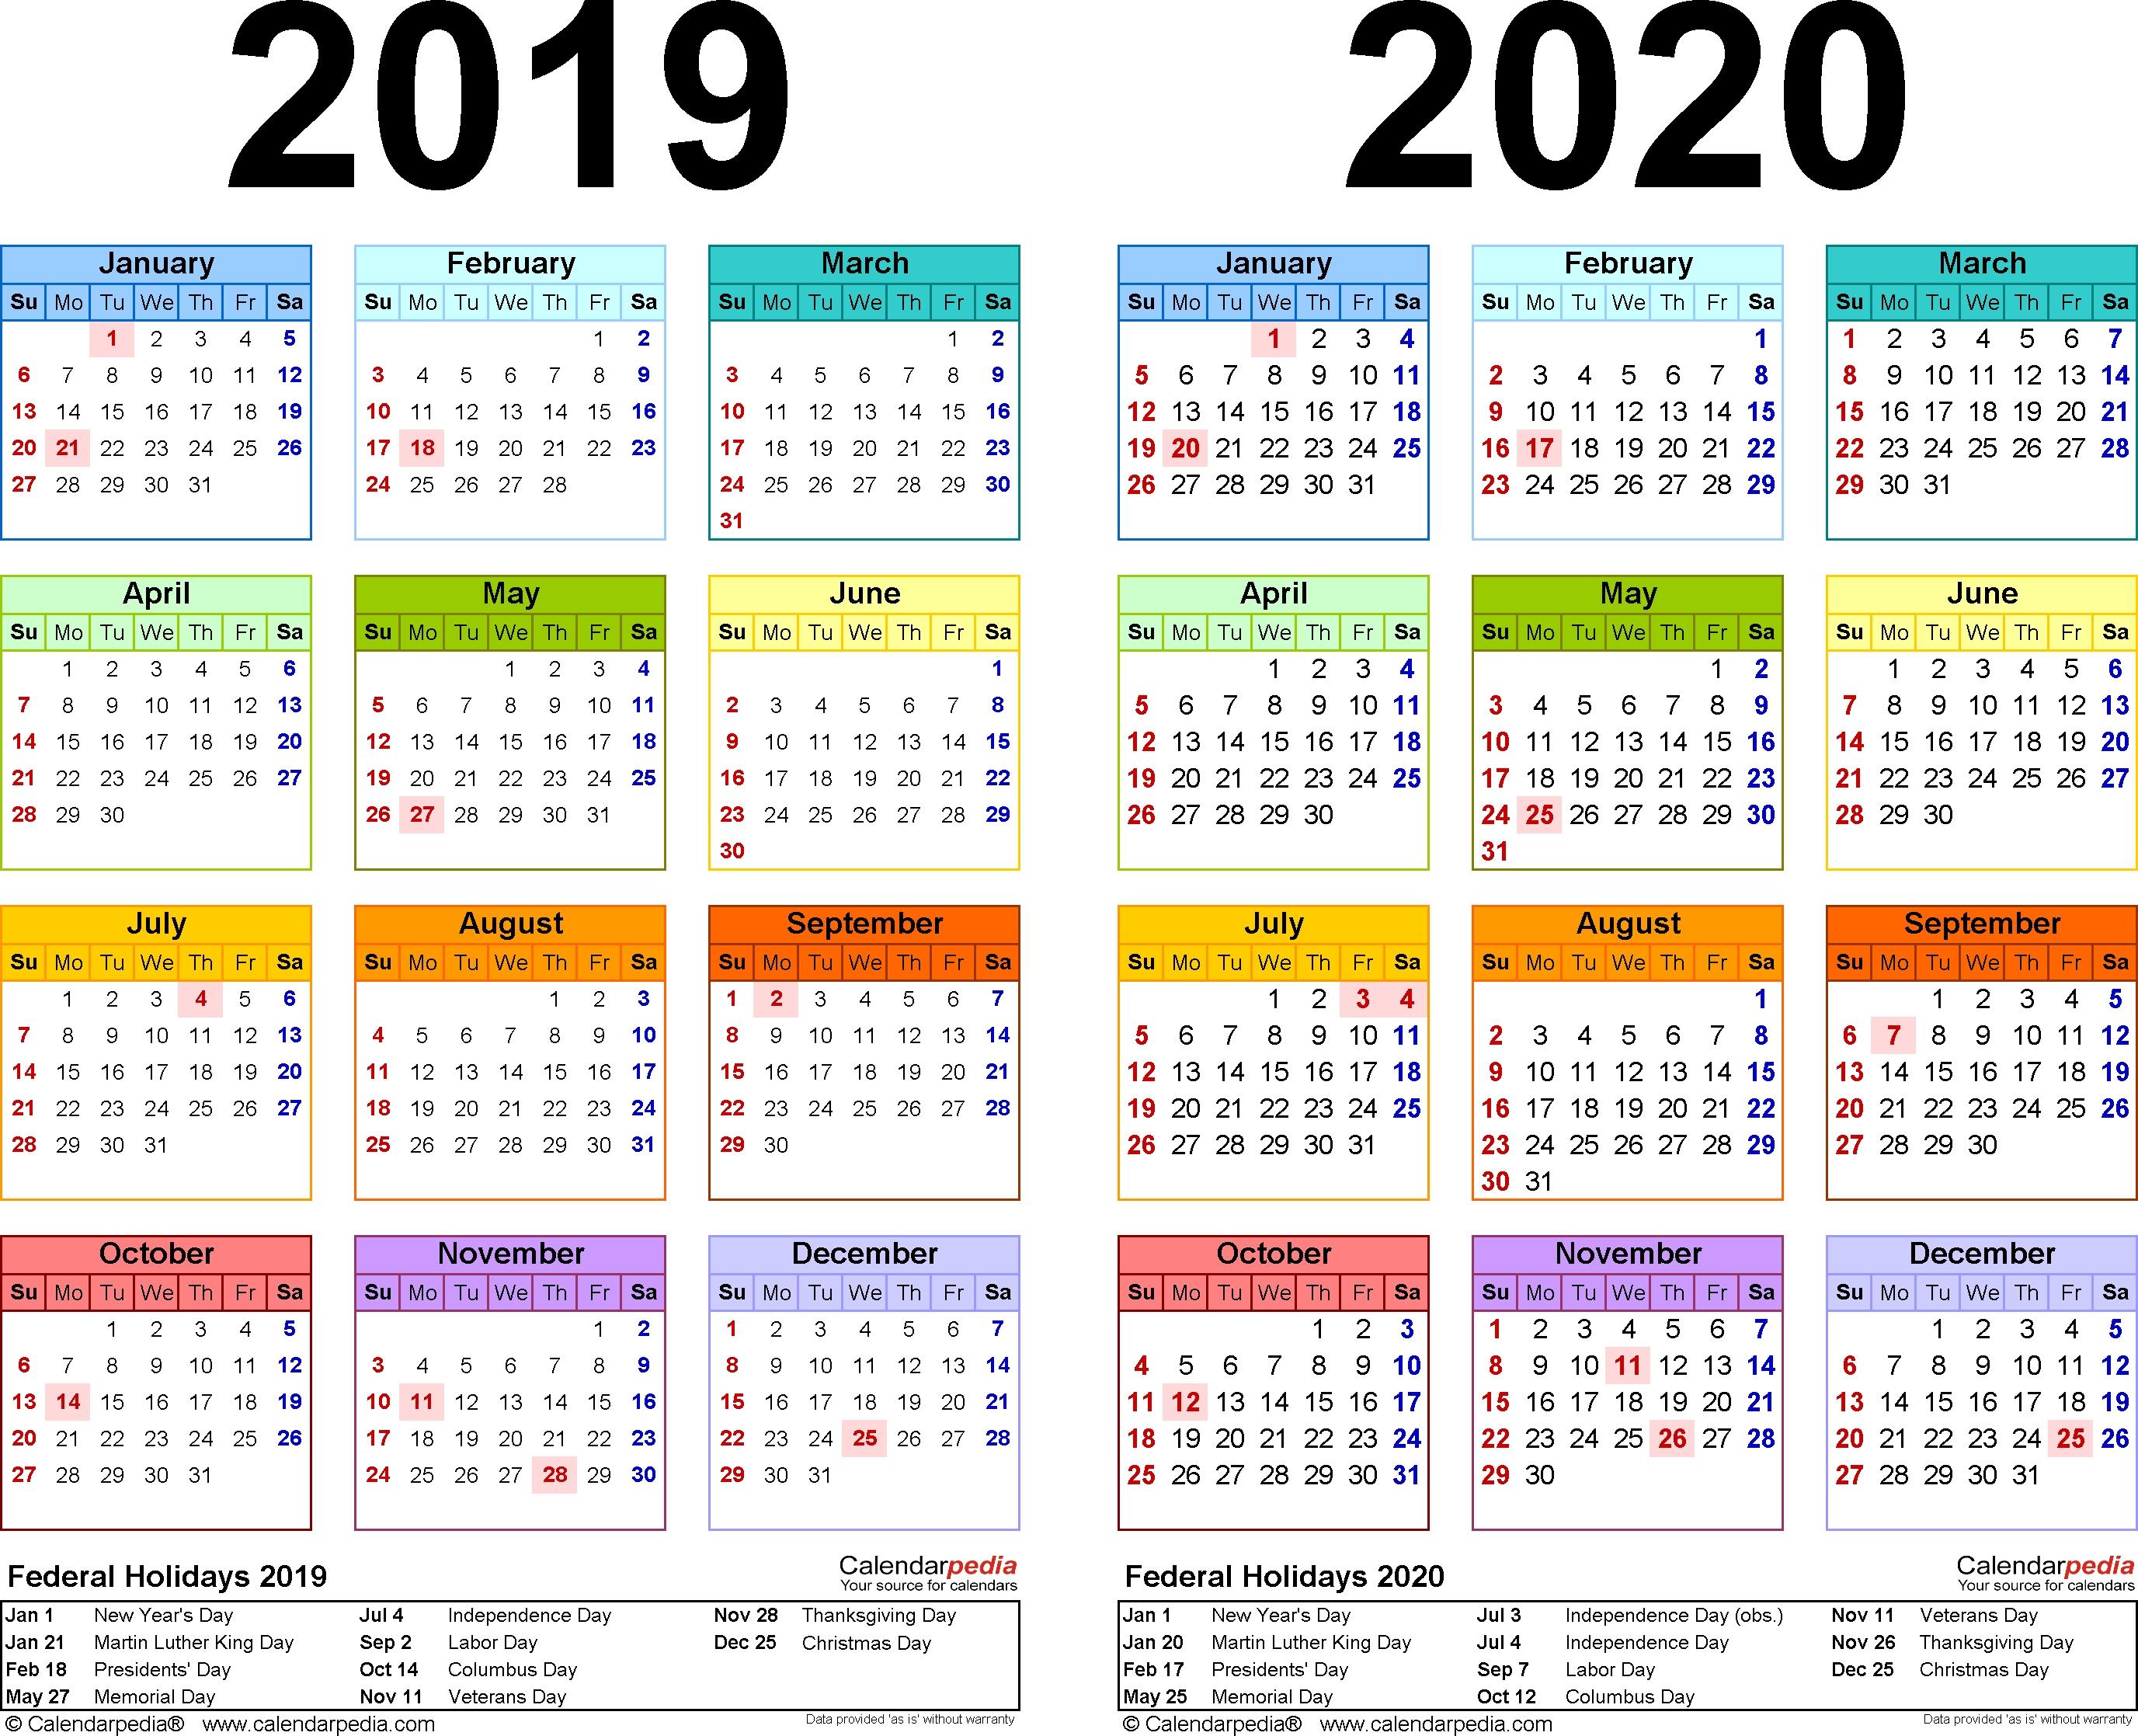 2019-2020 Calendar - Free Printable Two-Year Word Calendars in 2019-2020 Academic Calendar Free Printable